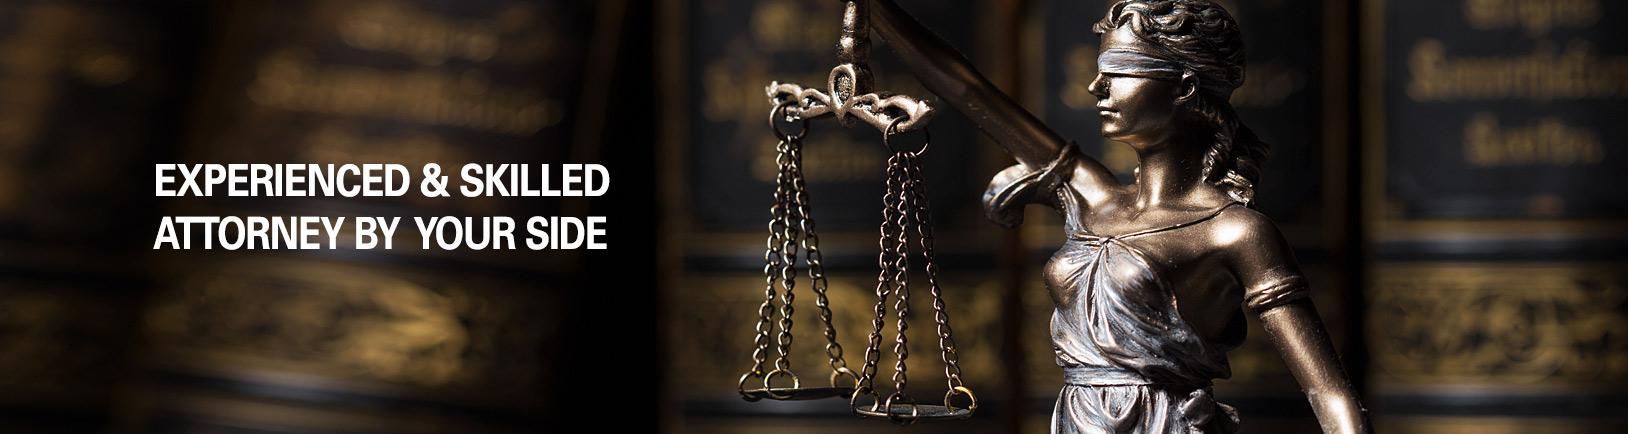 Belah-Hamideh-Law-Hero-Image-English-1.jpg